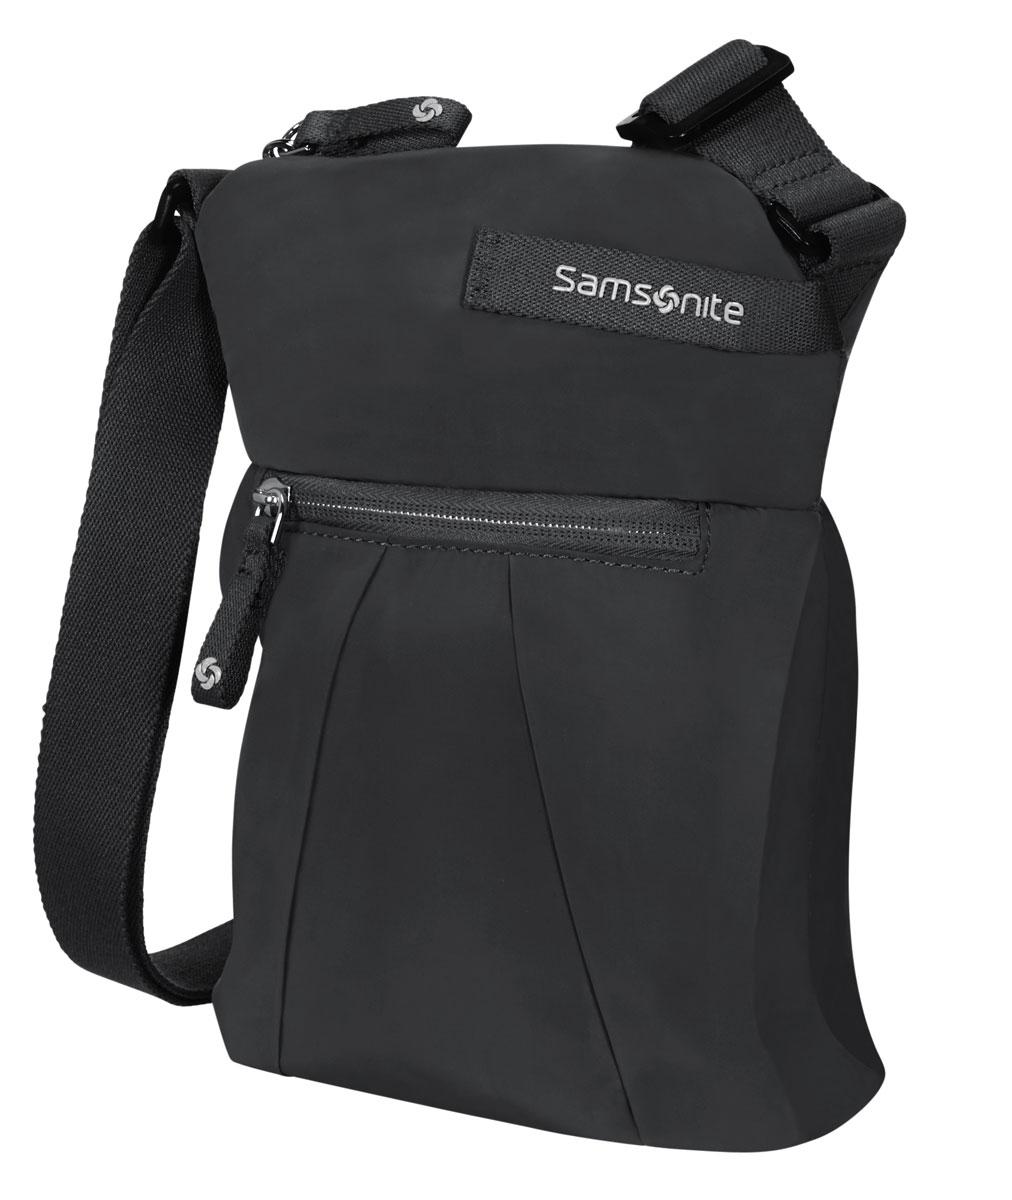 Samsonite Сумка плечевая черный 150*50*21051V-09004